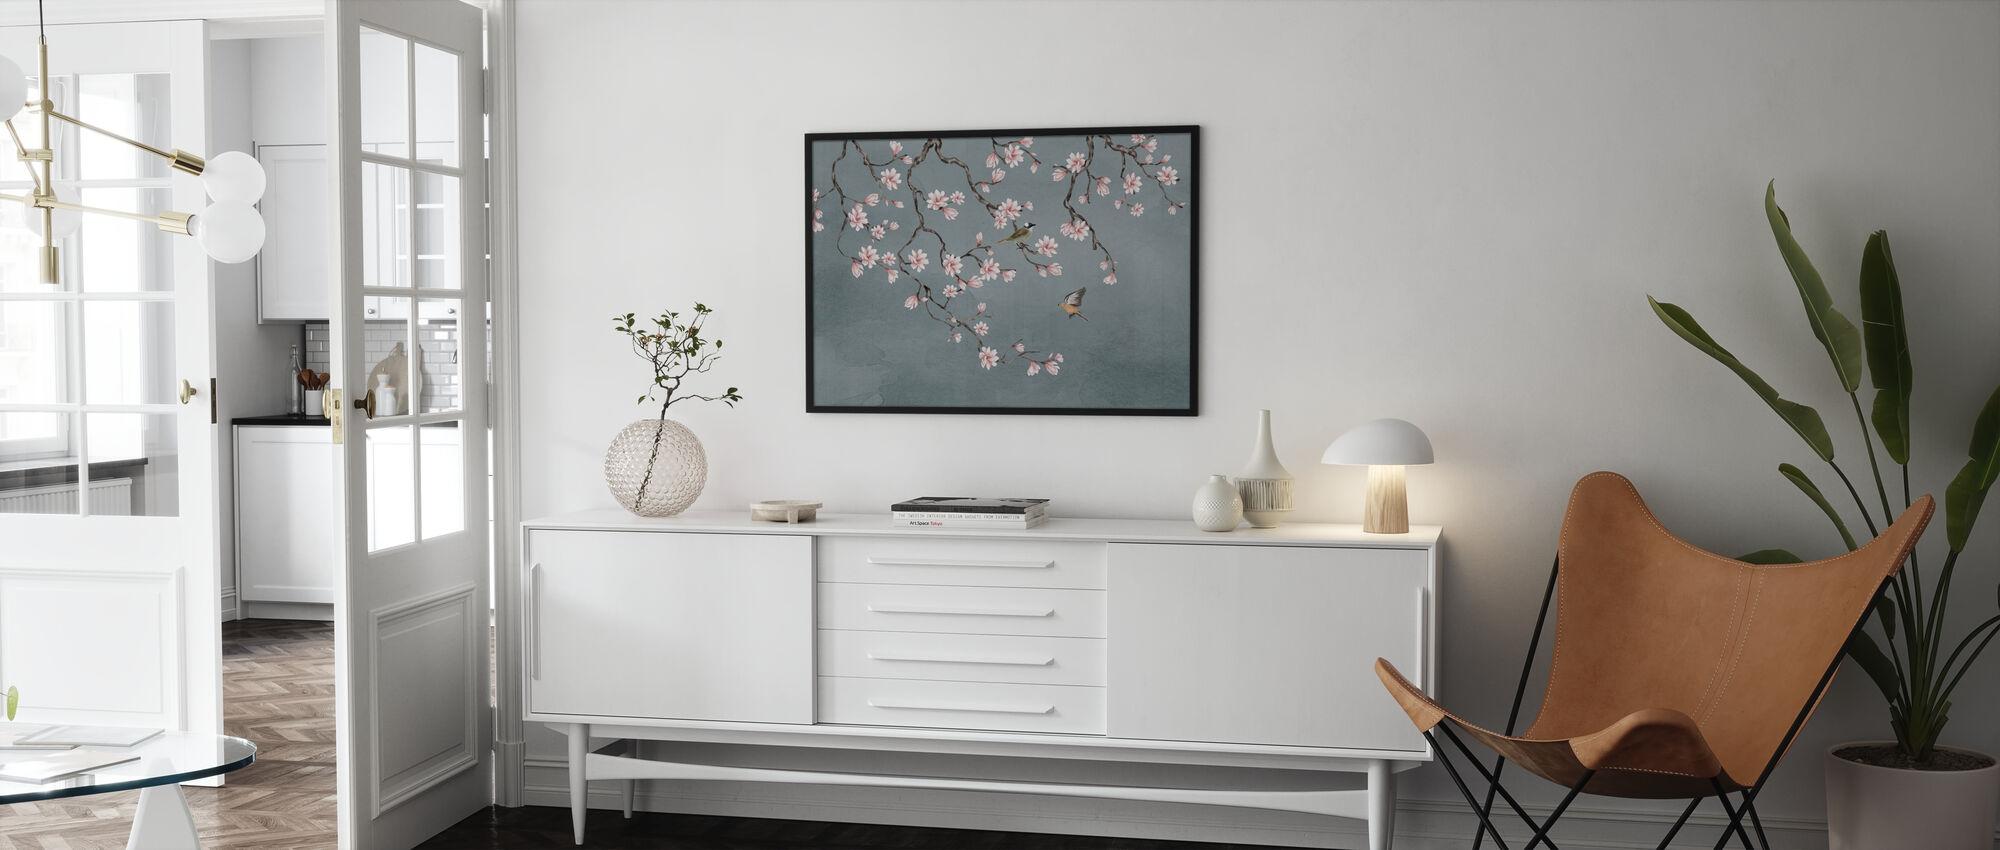 Birds Meeting Place - Framed print - Living Room